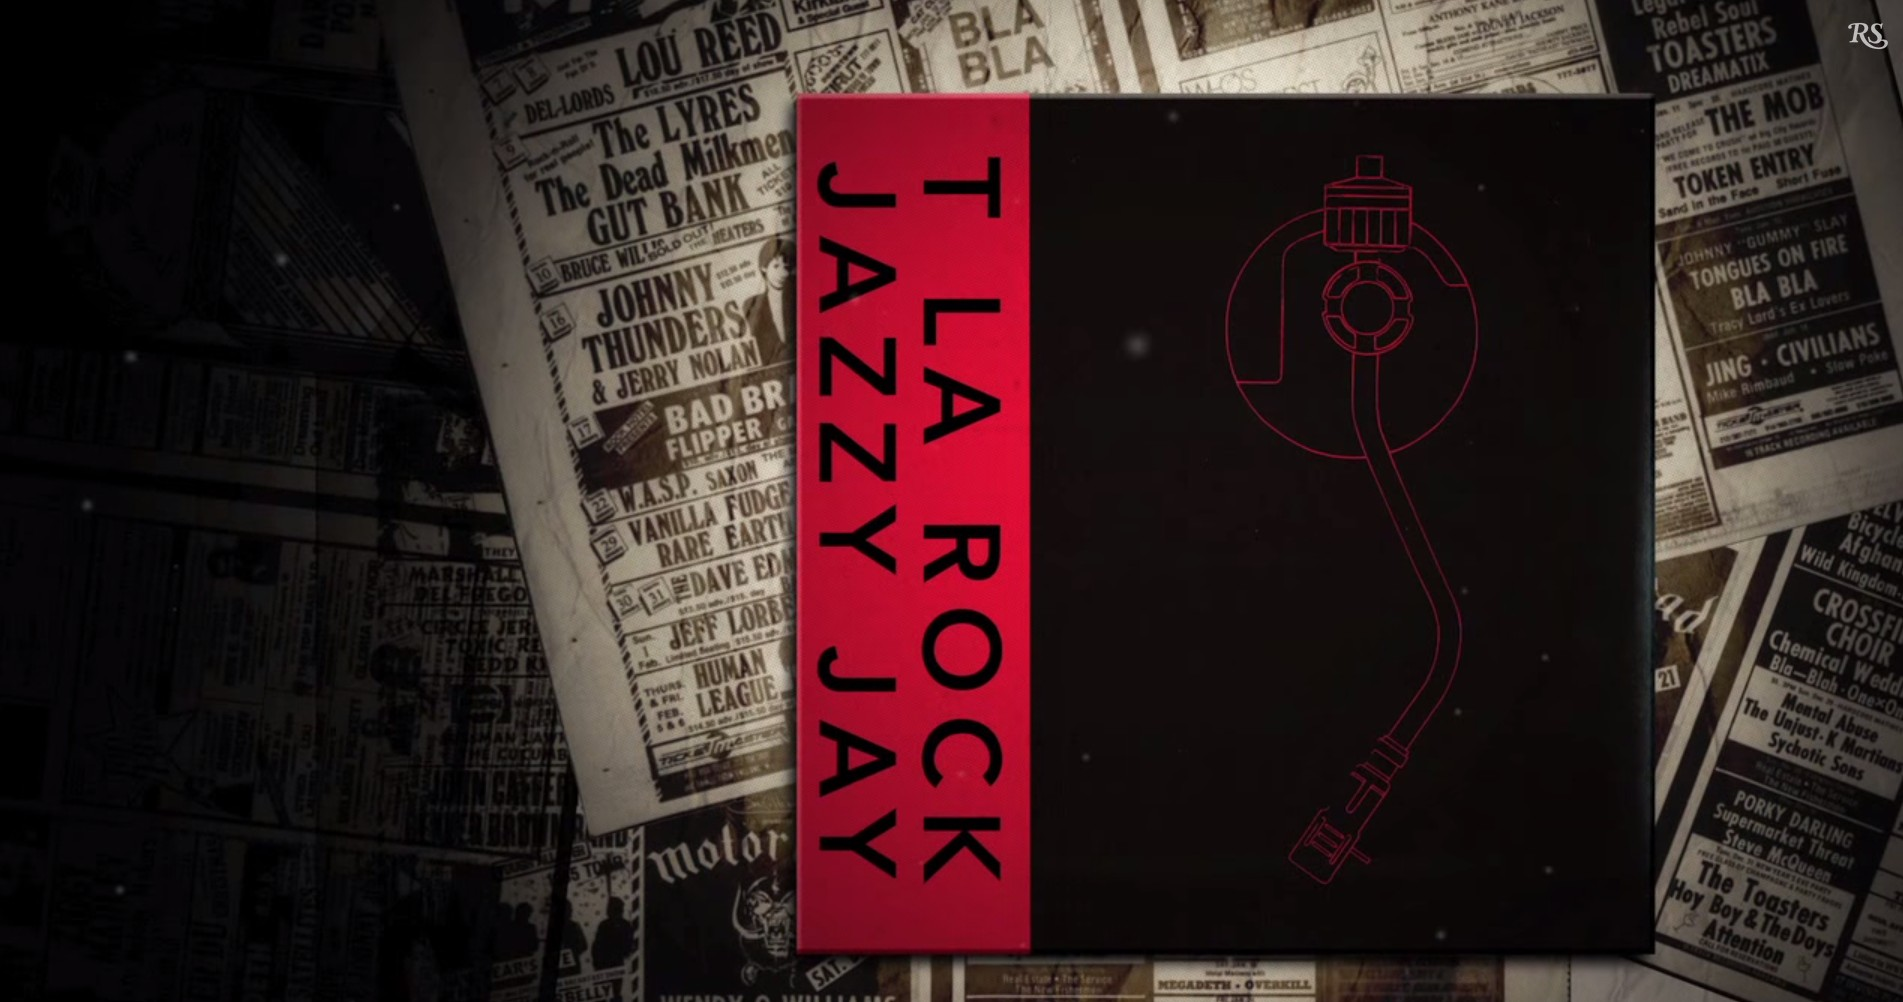 Рик Рубин: Моя жизнь в 21ой песне. T La Rock и Jazzy Jay - It's Yours. 1984